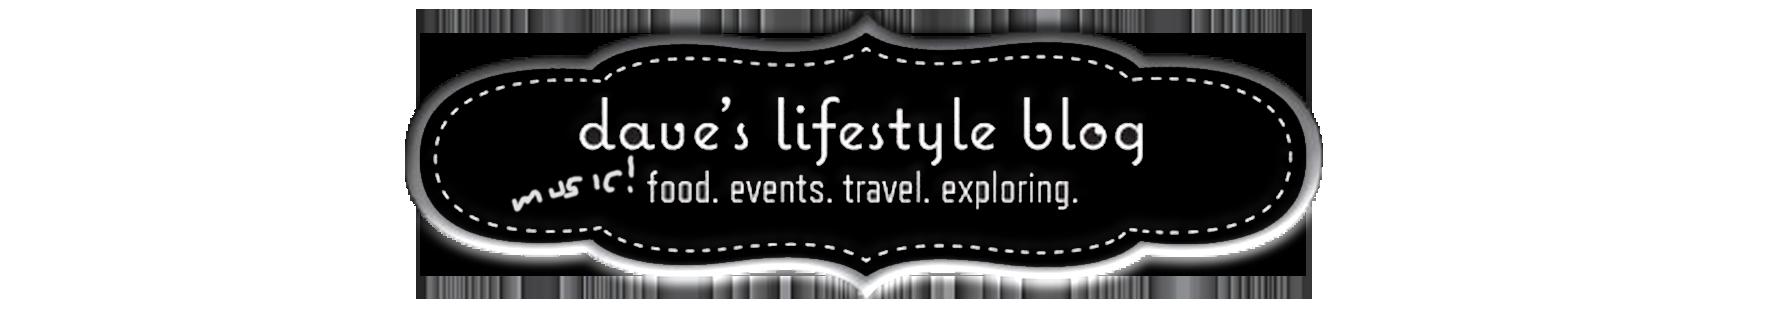 Dave's Lifestyle Blog